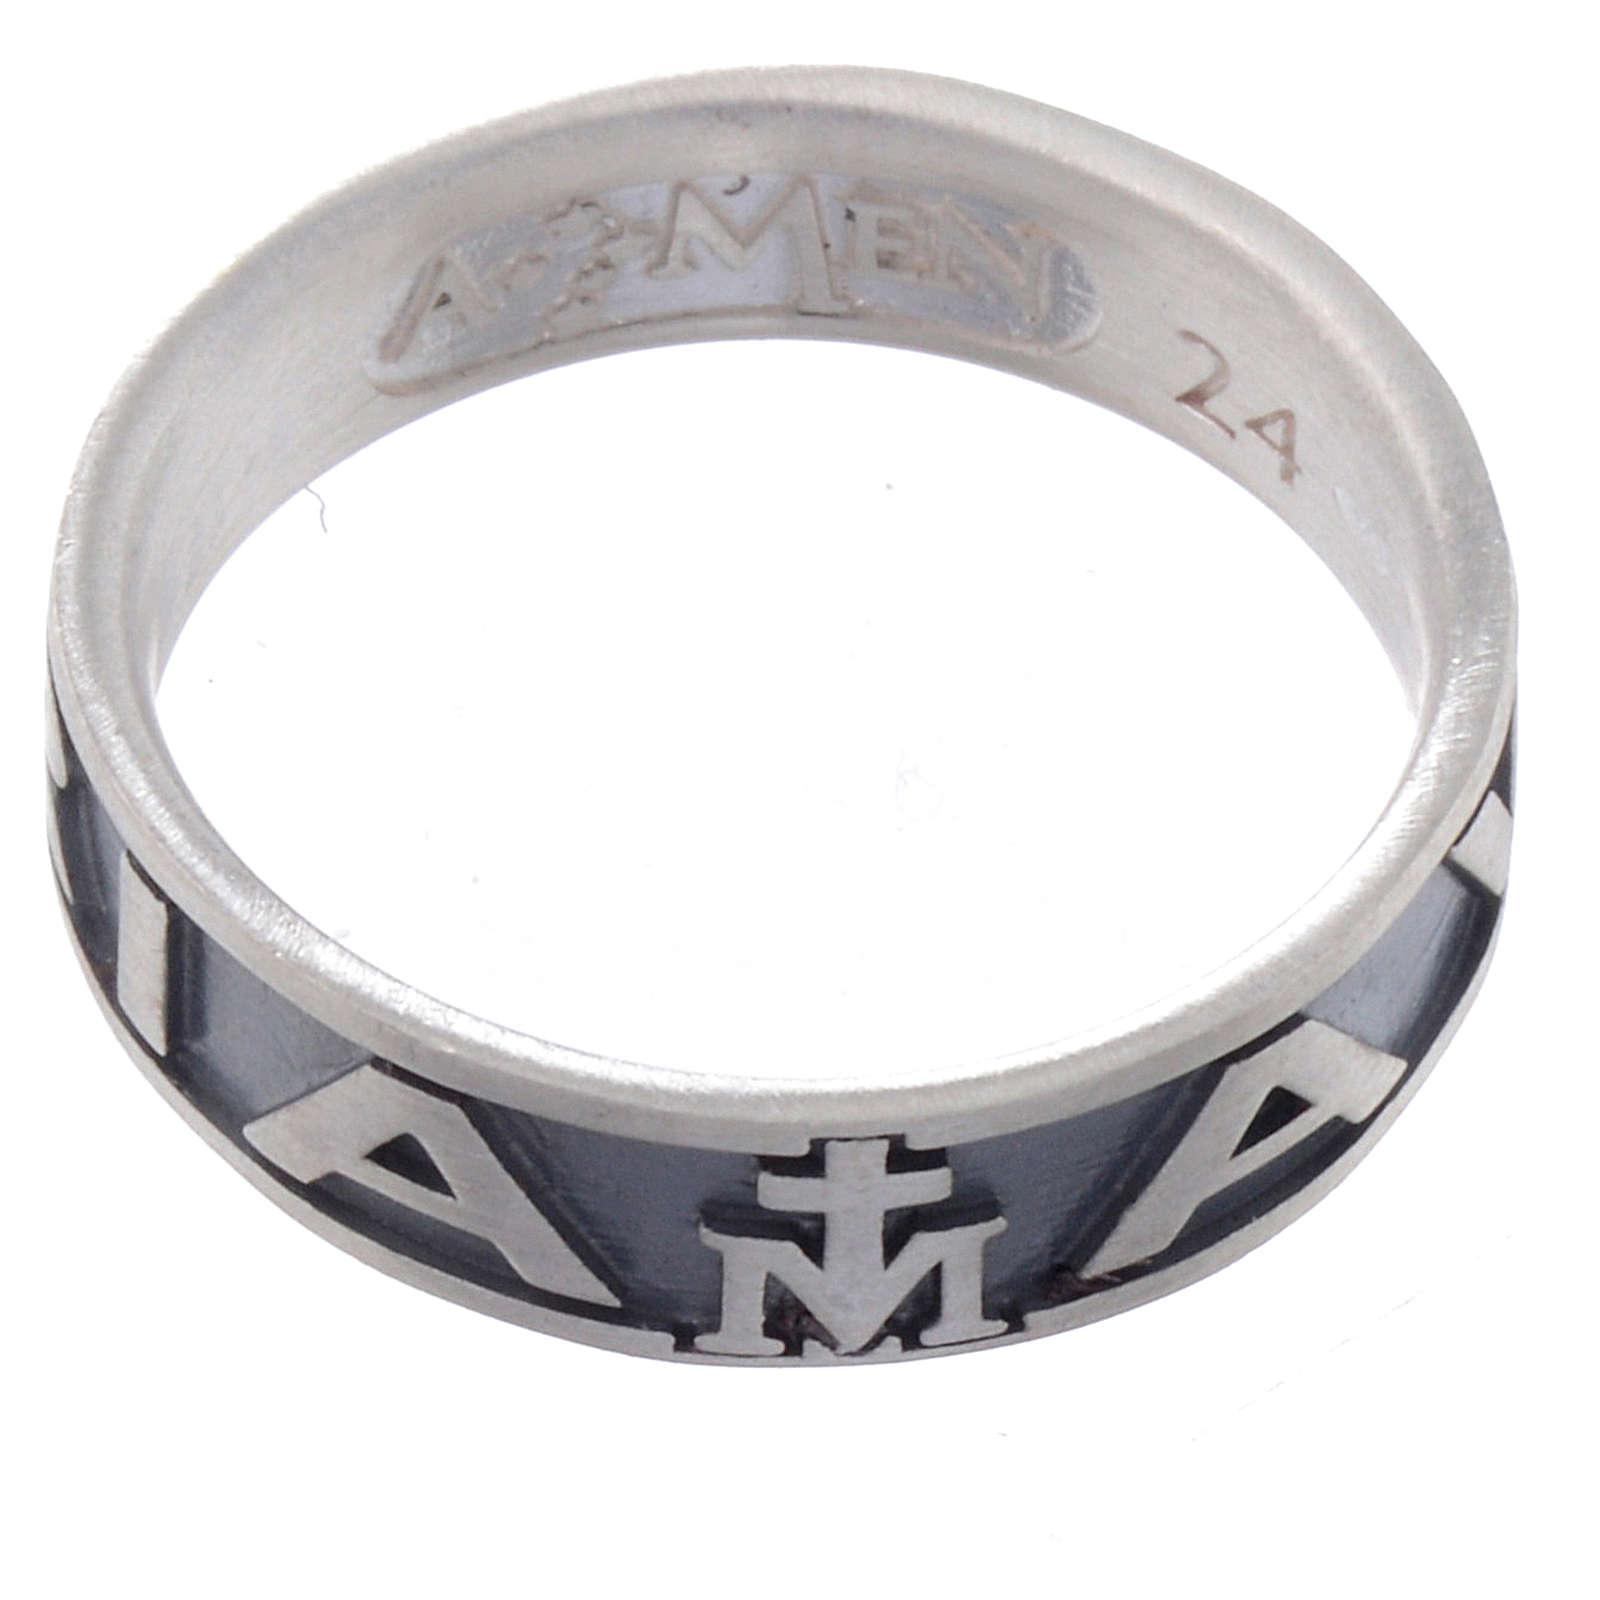 Ring AMEN Hail Mary silver 925, Burnished finish 3